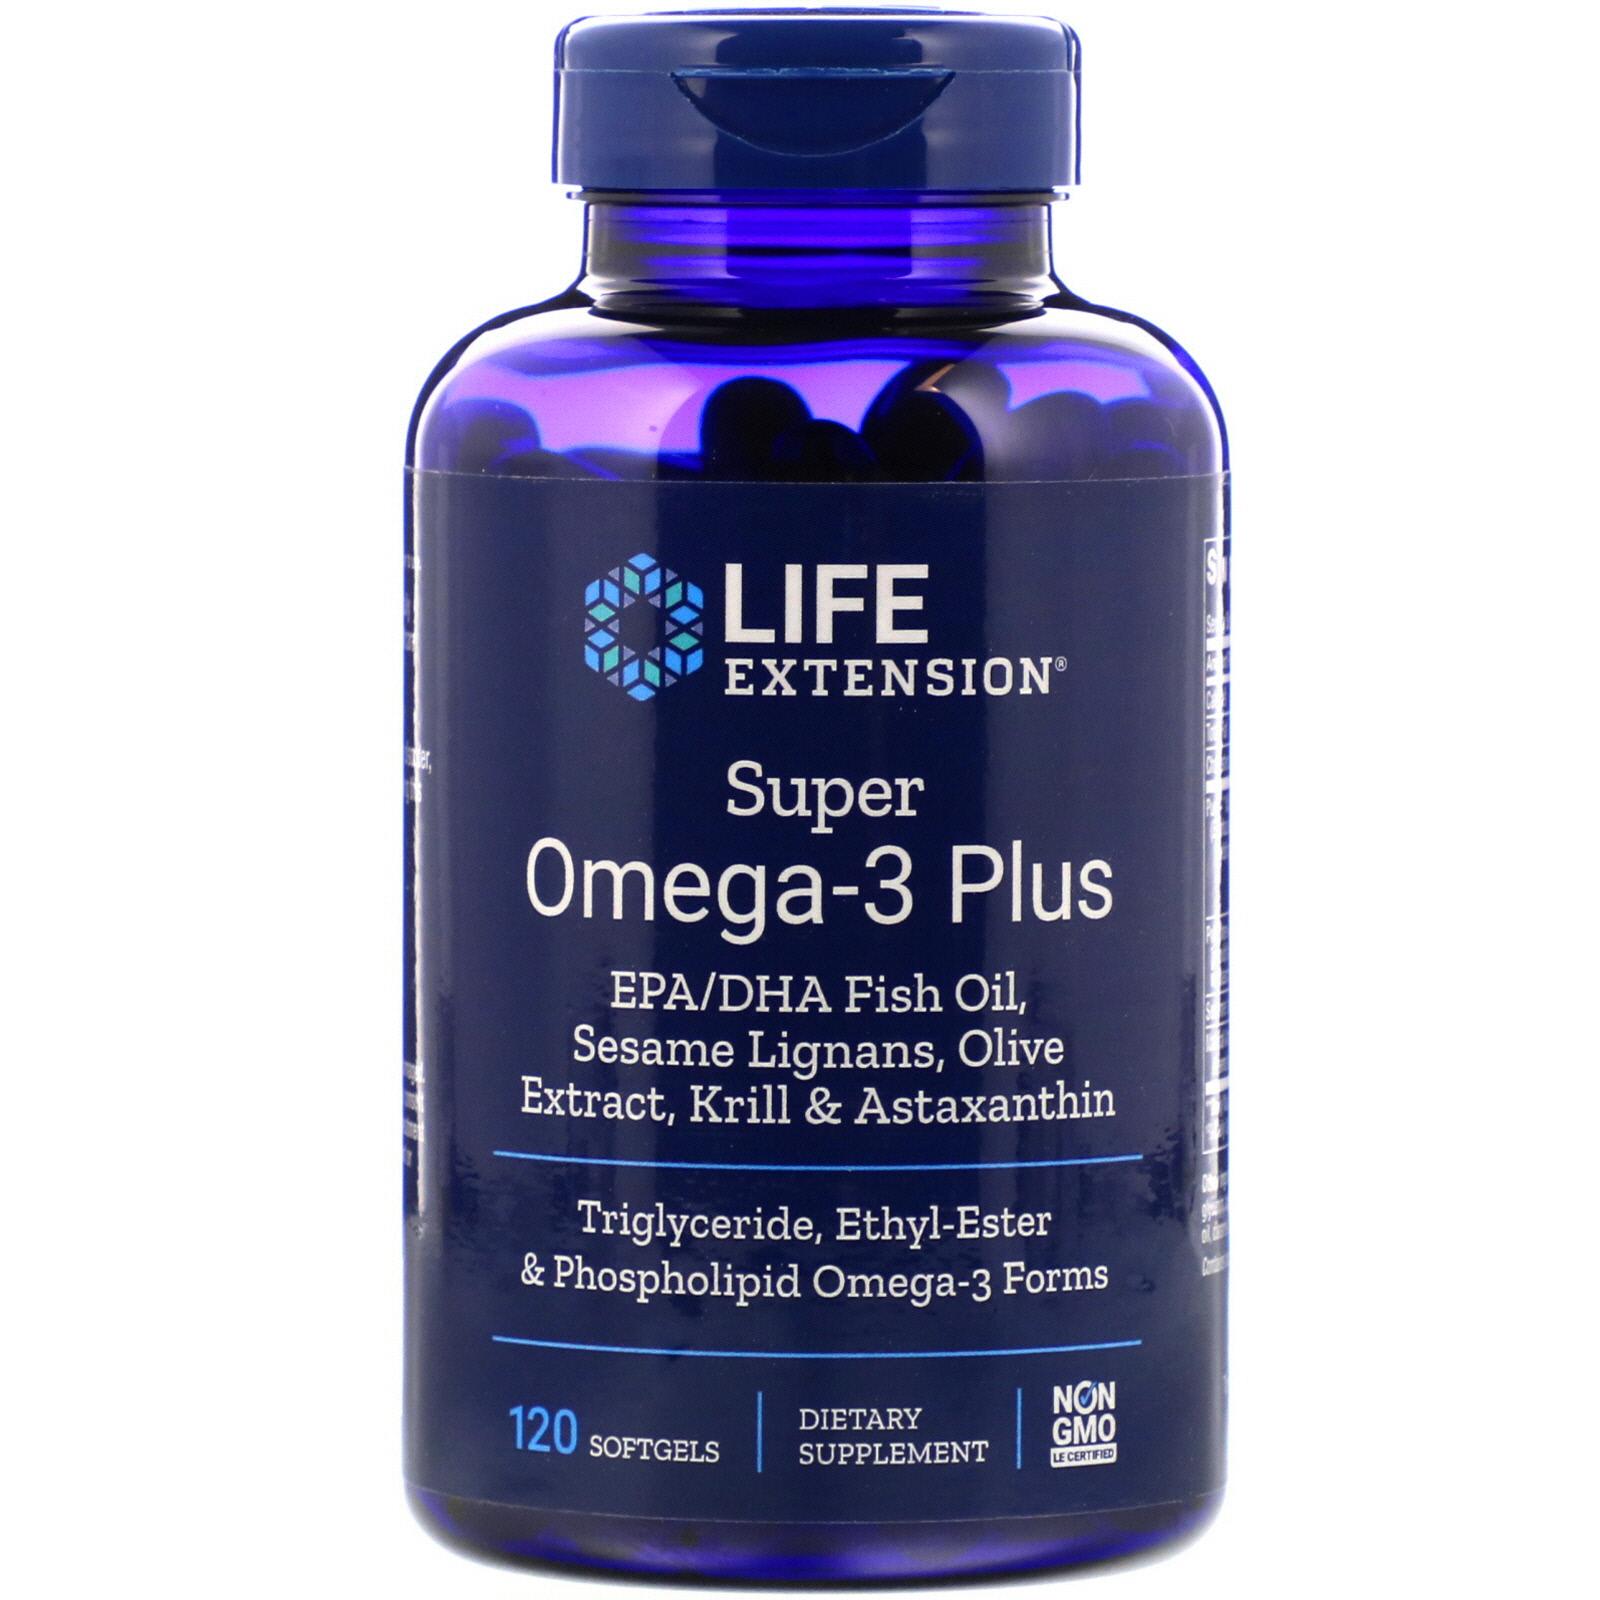 Life Extension Super Omega-3 Plus 120 Softgels - iHerb